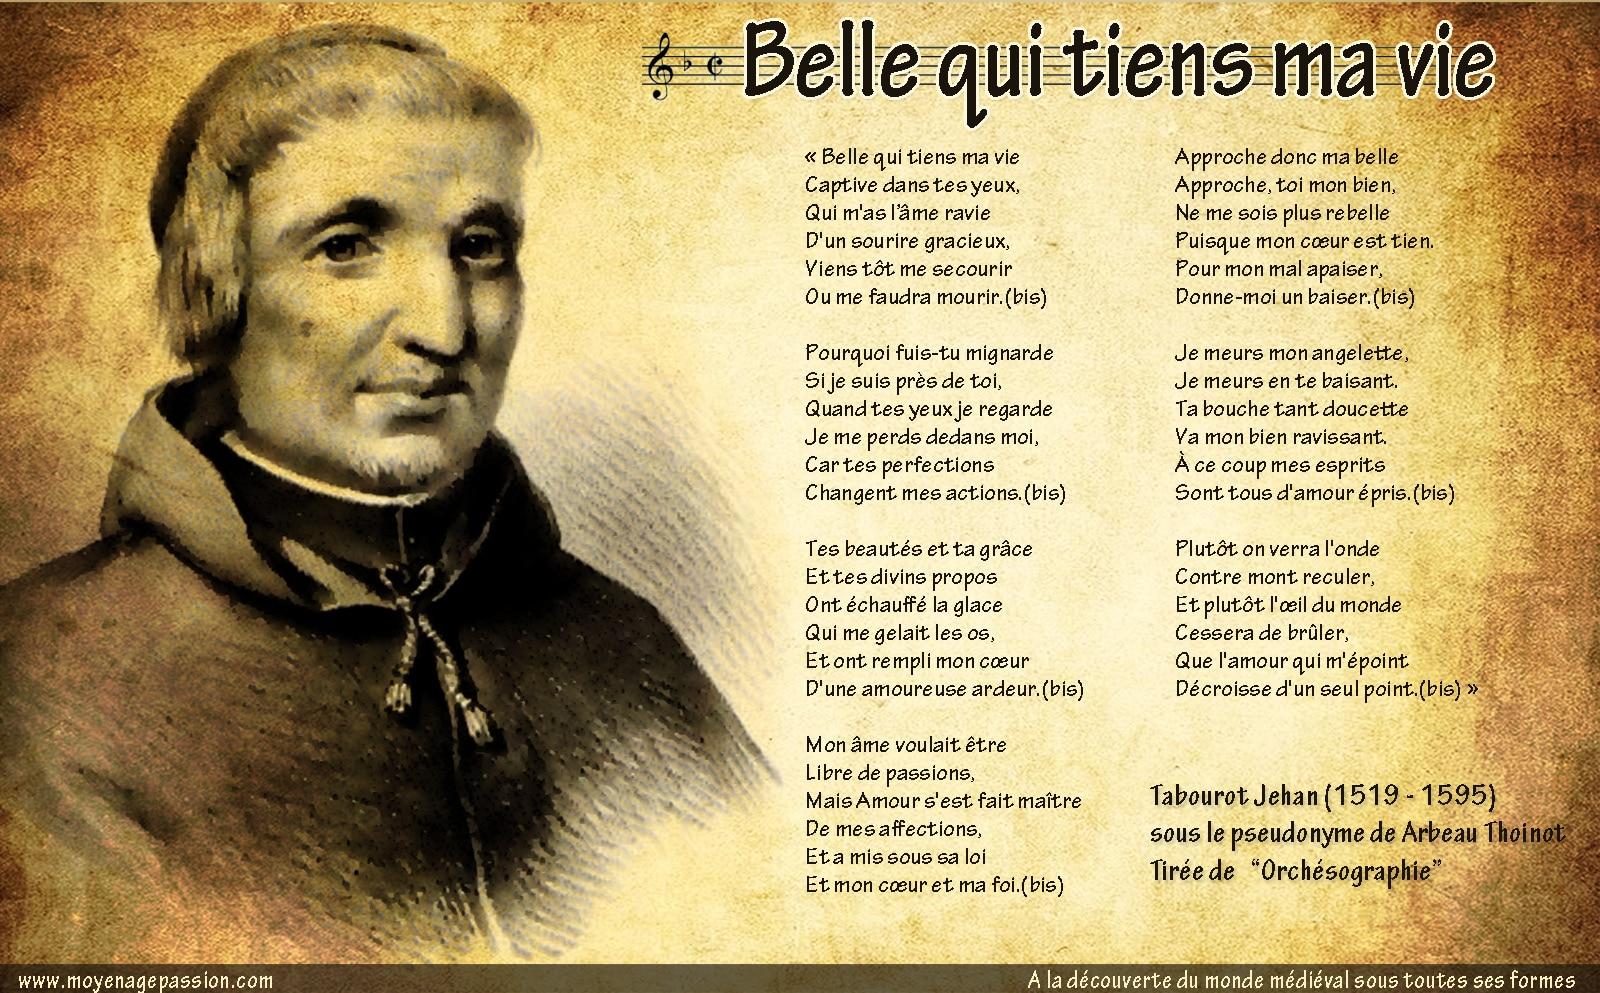 chanson_renaissance_kaamelott_belle_qui_tient_ma_vie_jehan_tabourot_Thoinot_Arbeau